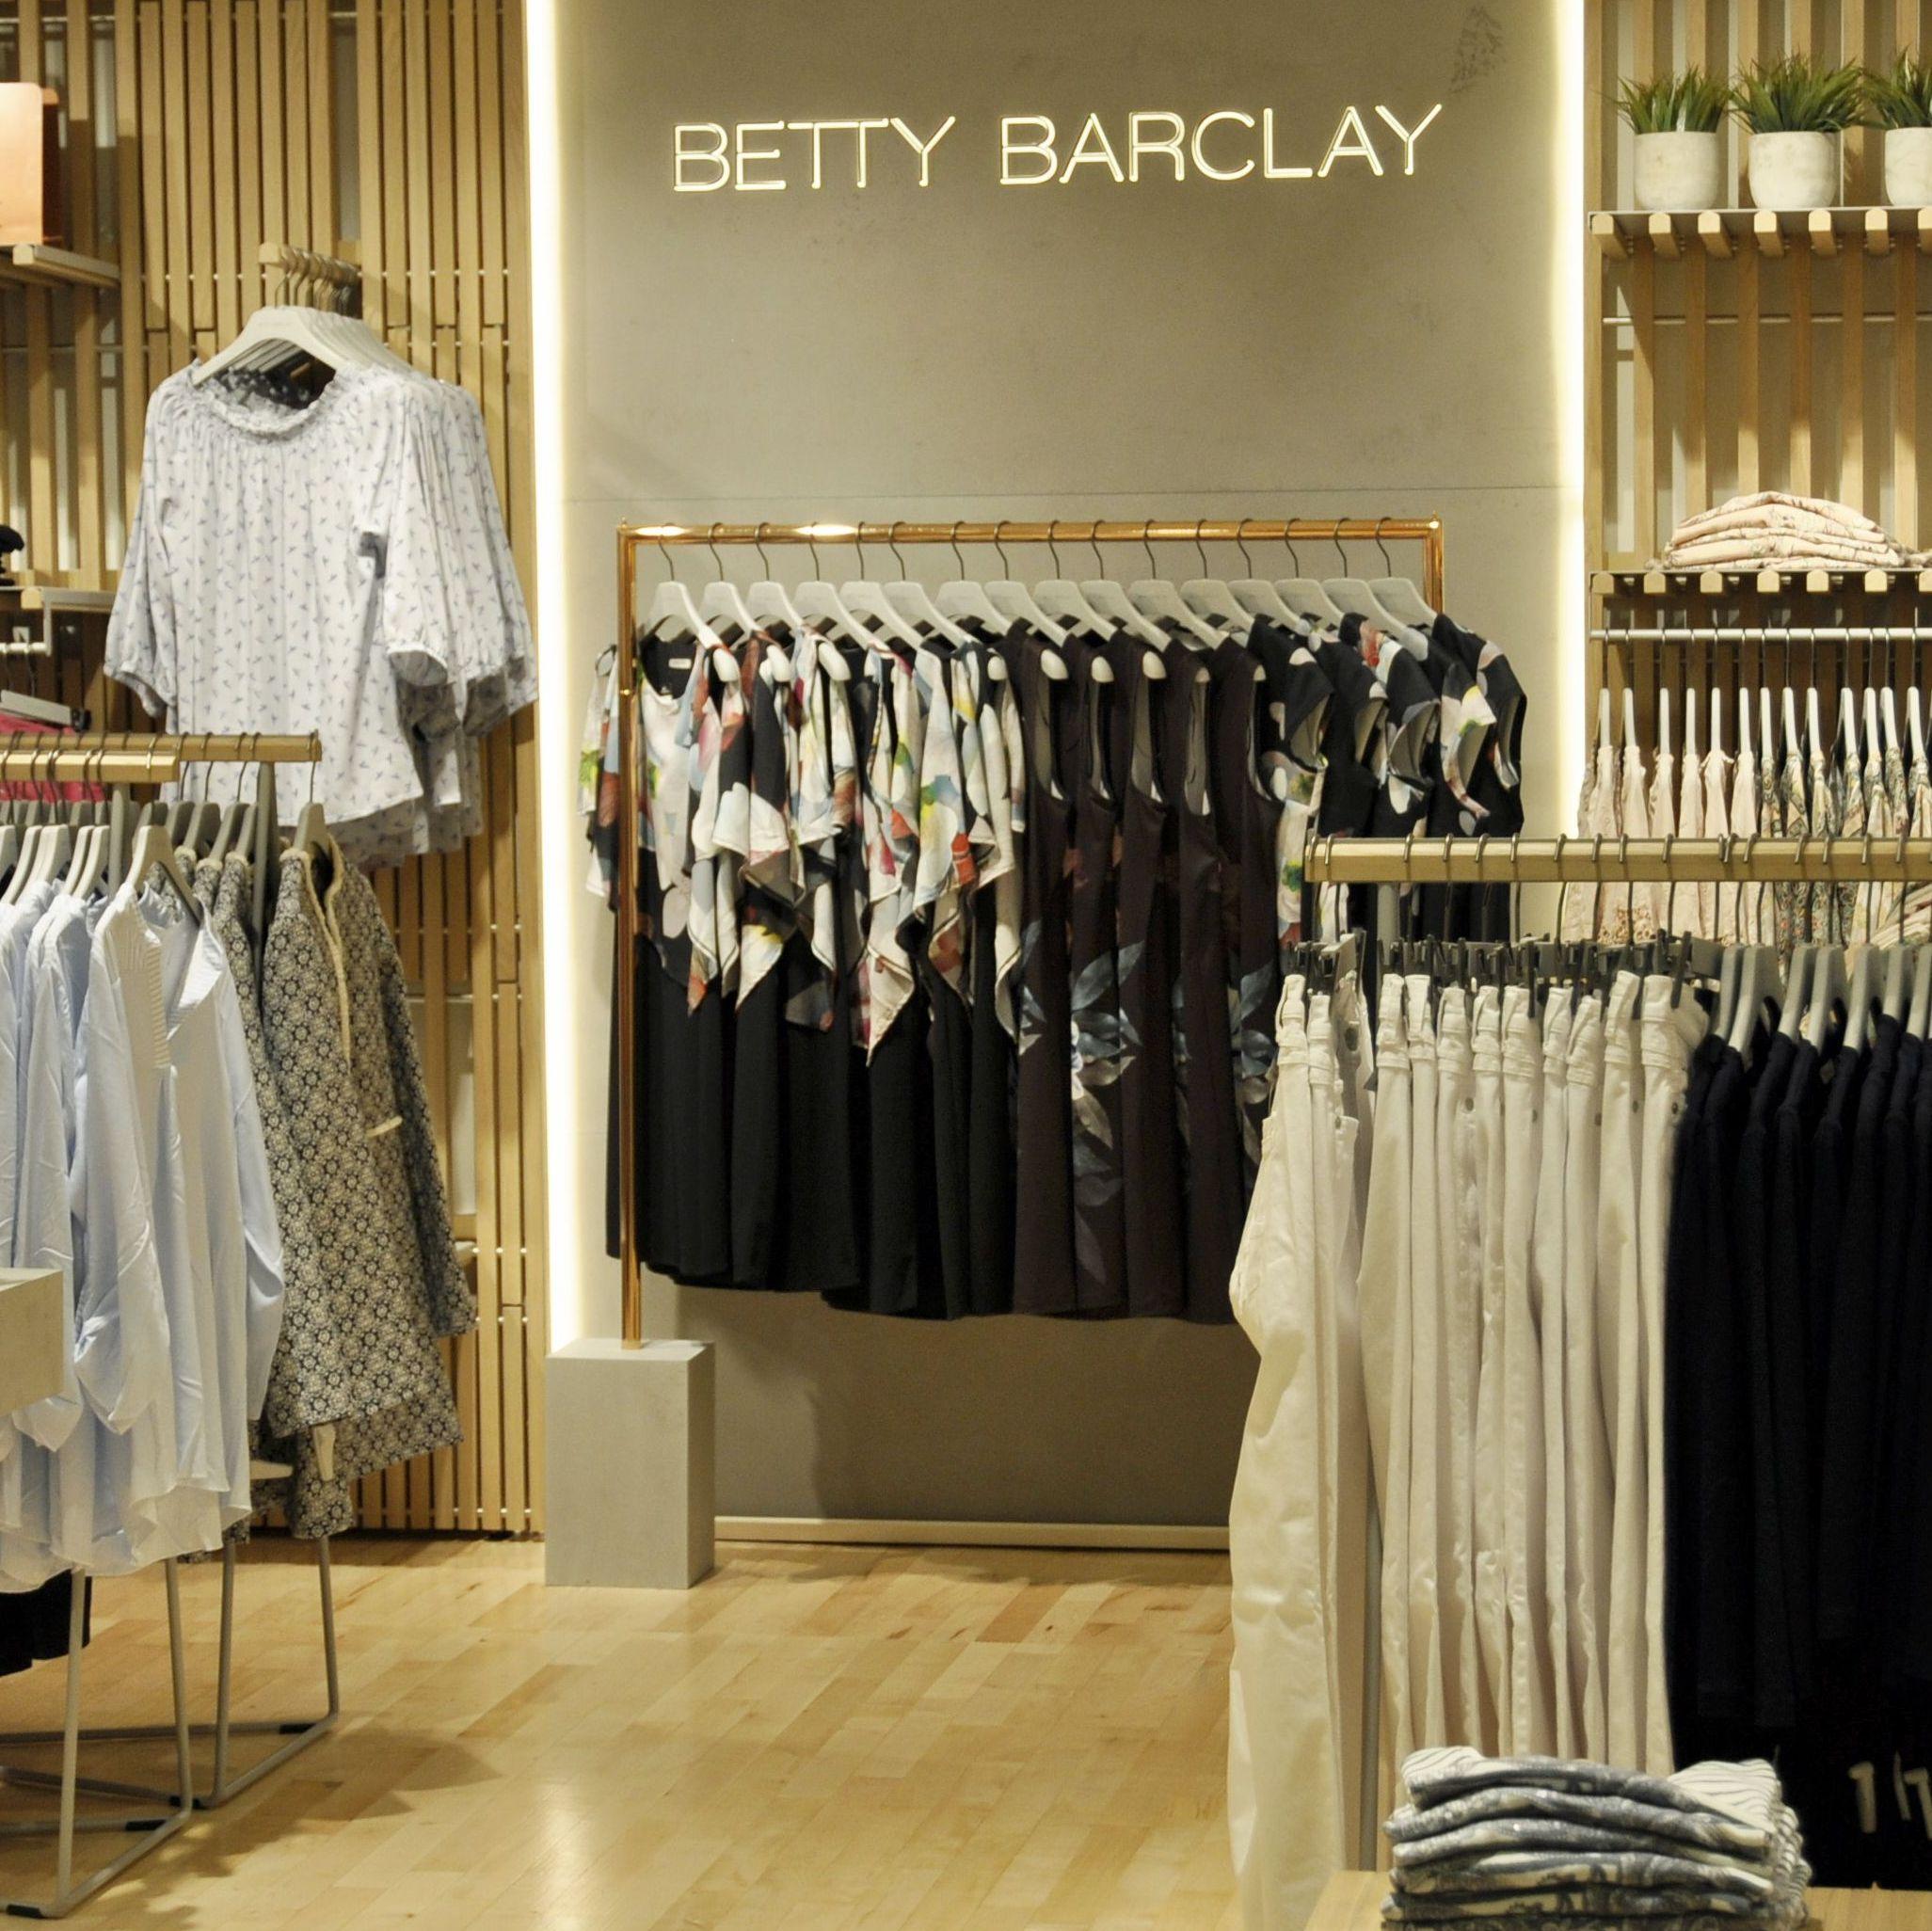 online retailer 2e605 54549 Strukturveränderung: Betty Barclay Group ordnet sich neu